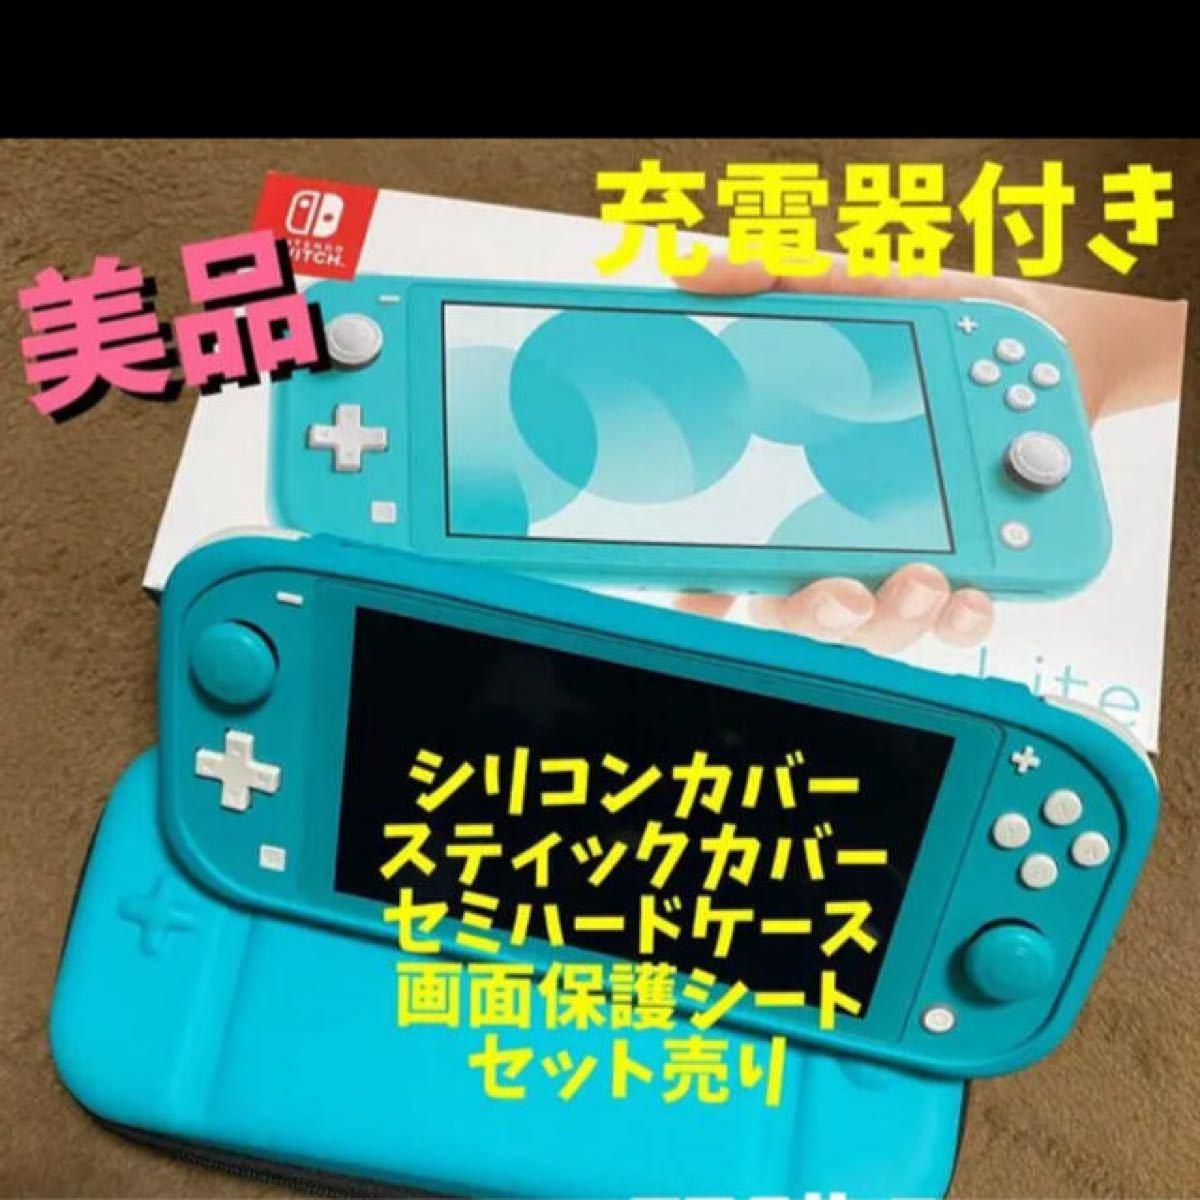 Nintendo switch lite 本体他セット